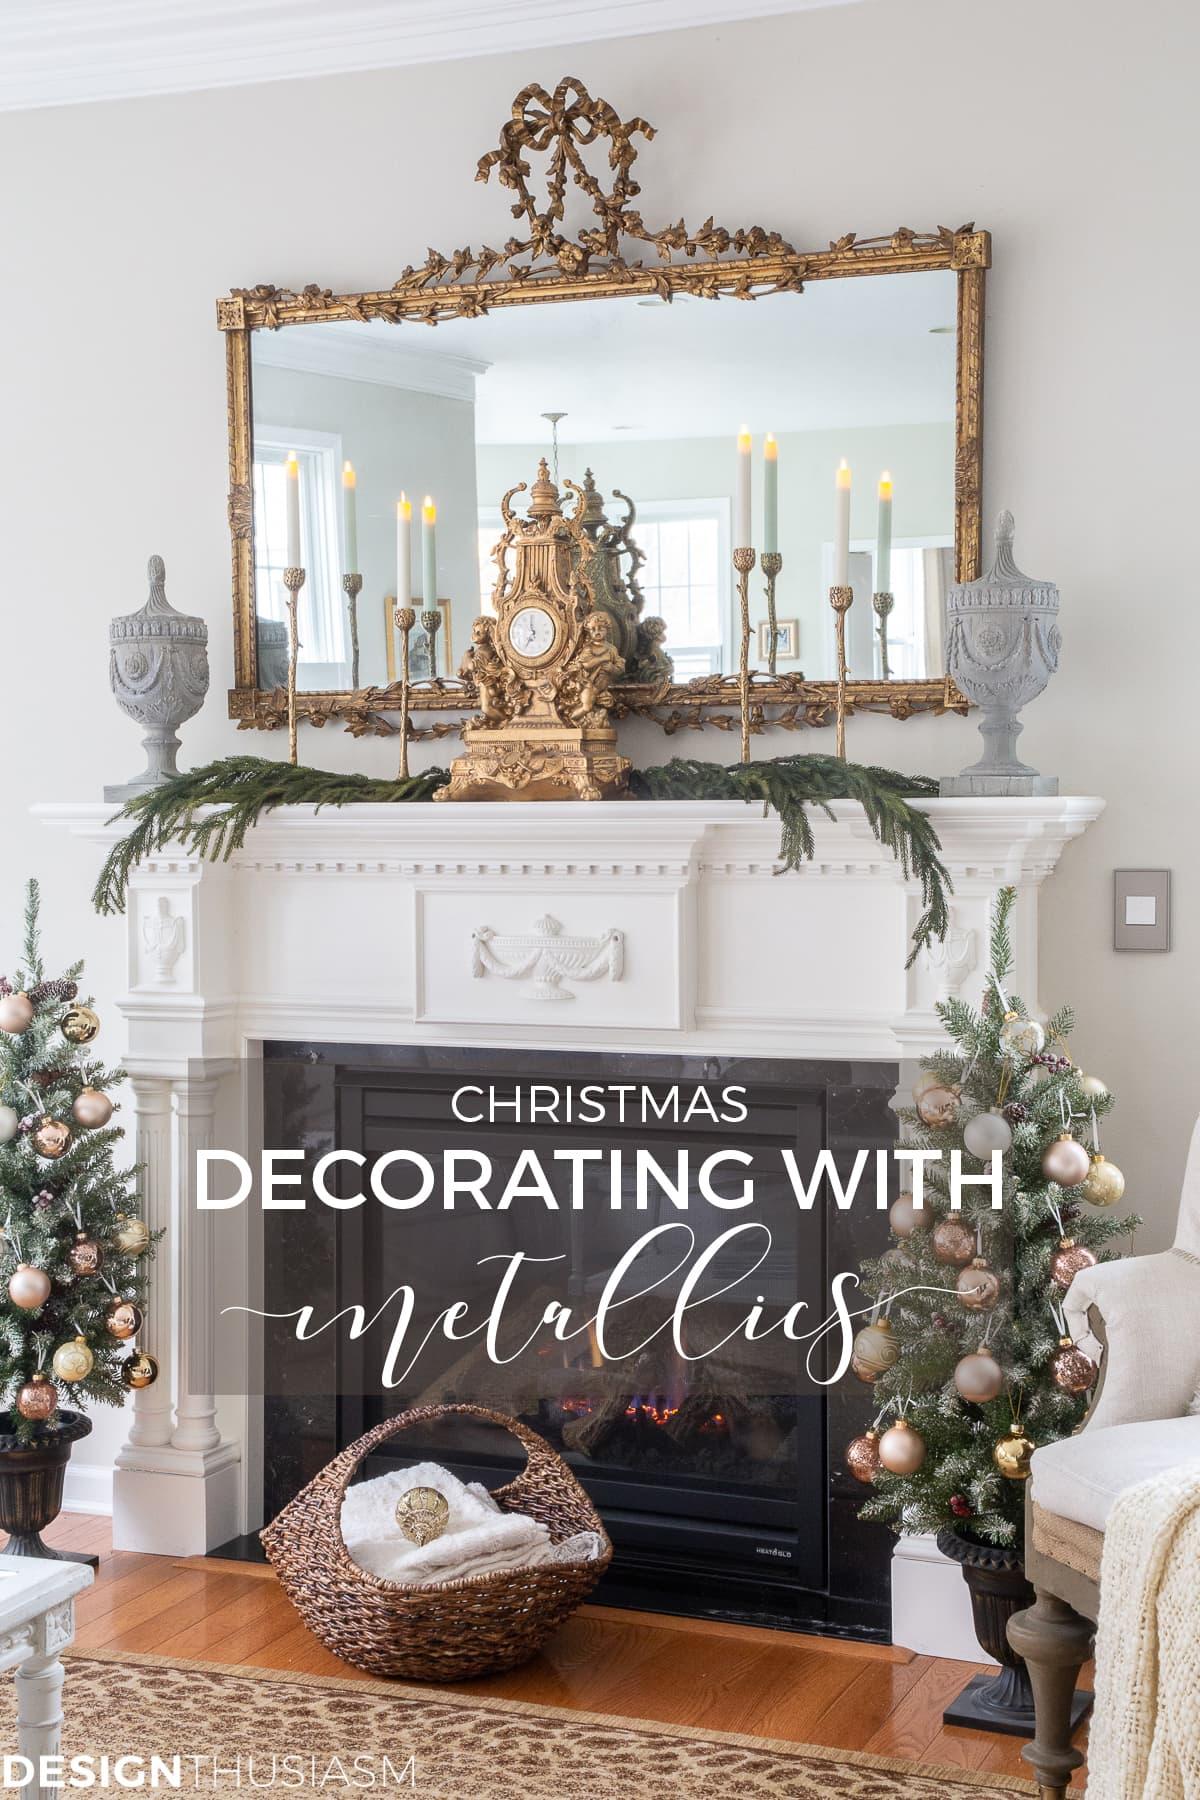 Christmas living room decorating with metallics